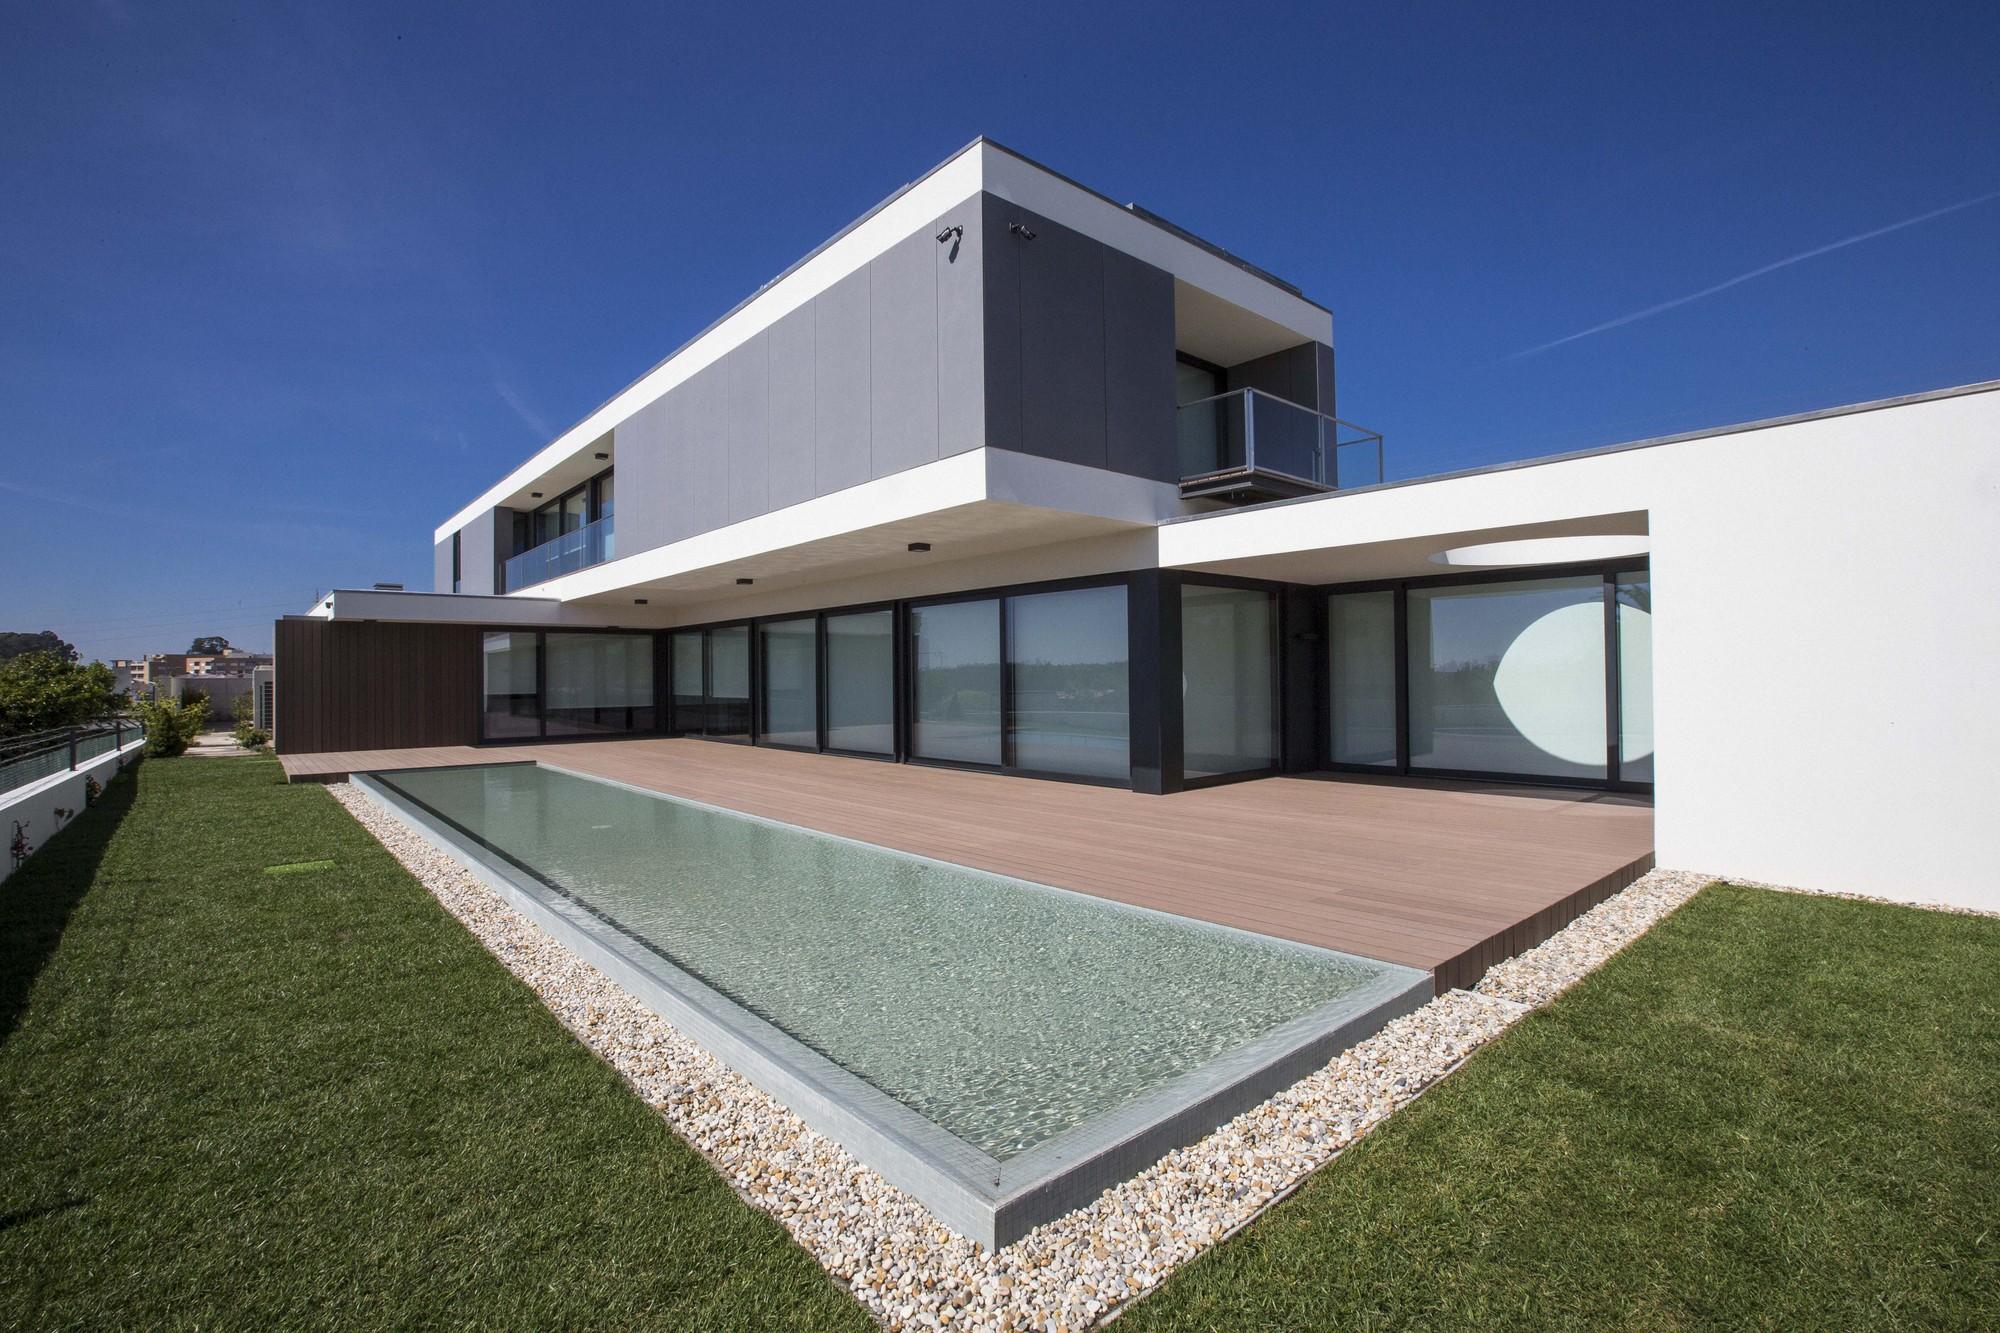 Santo tirso tag archdaily - Atelier arquitectura ...